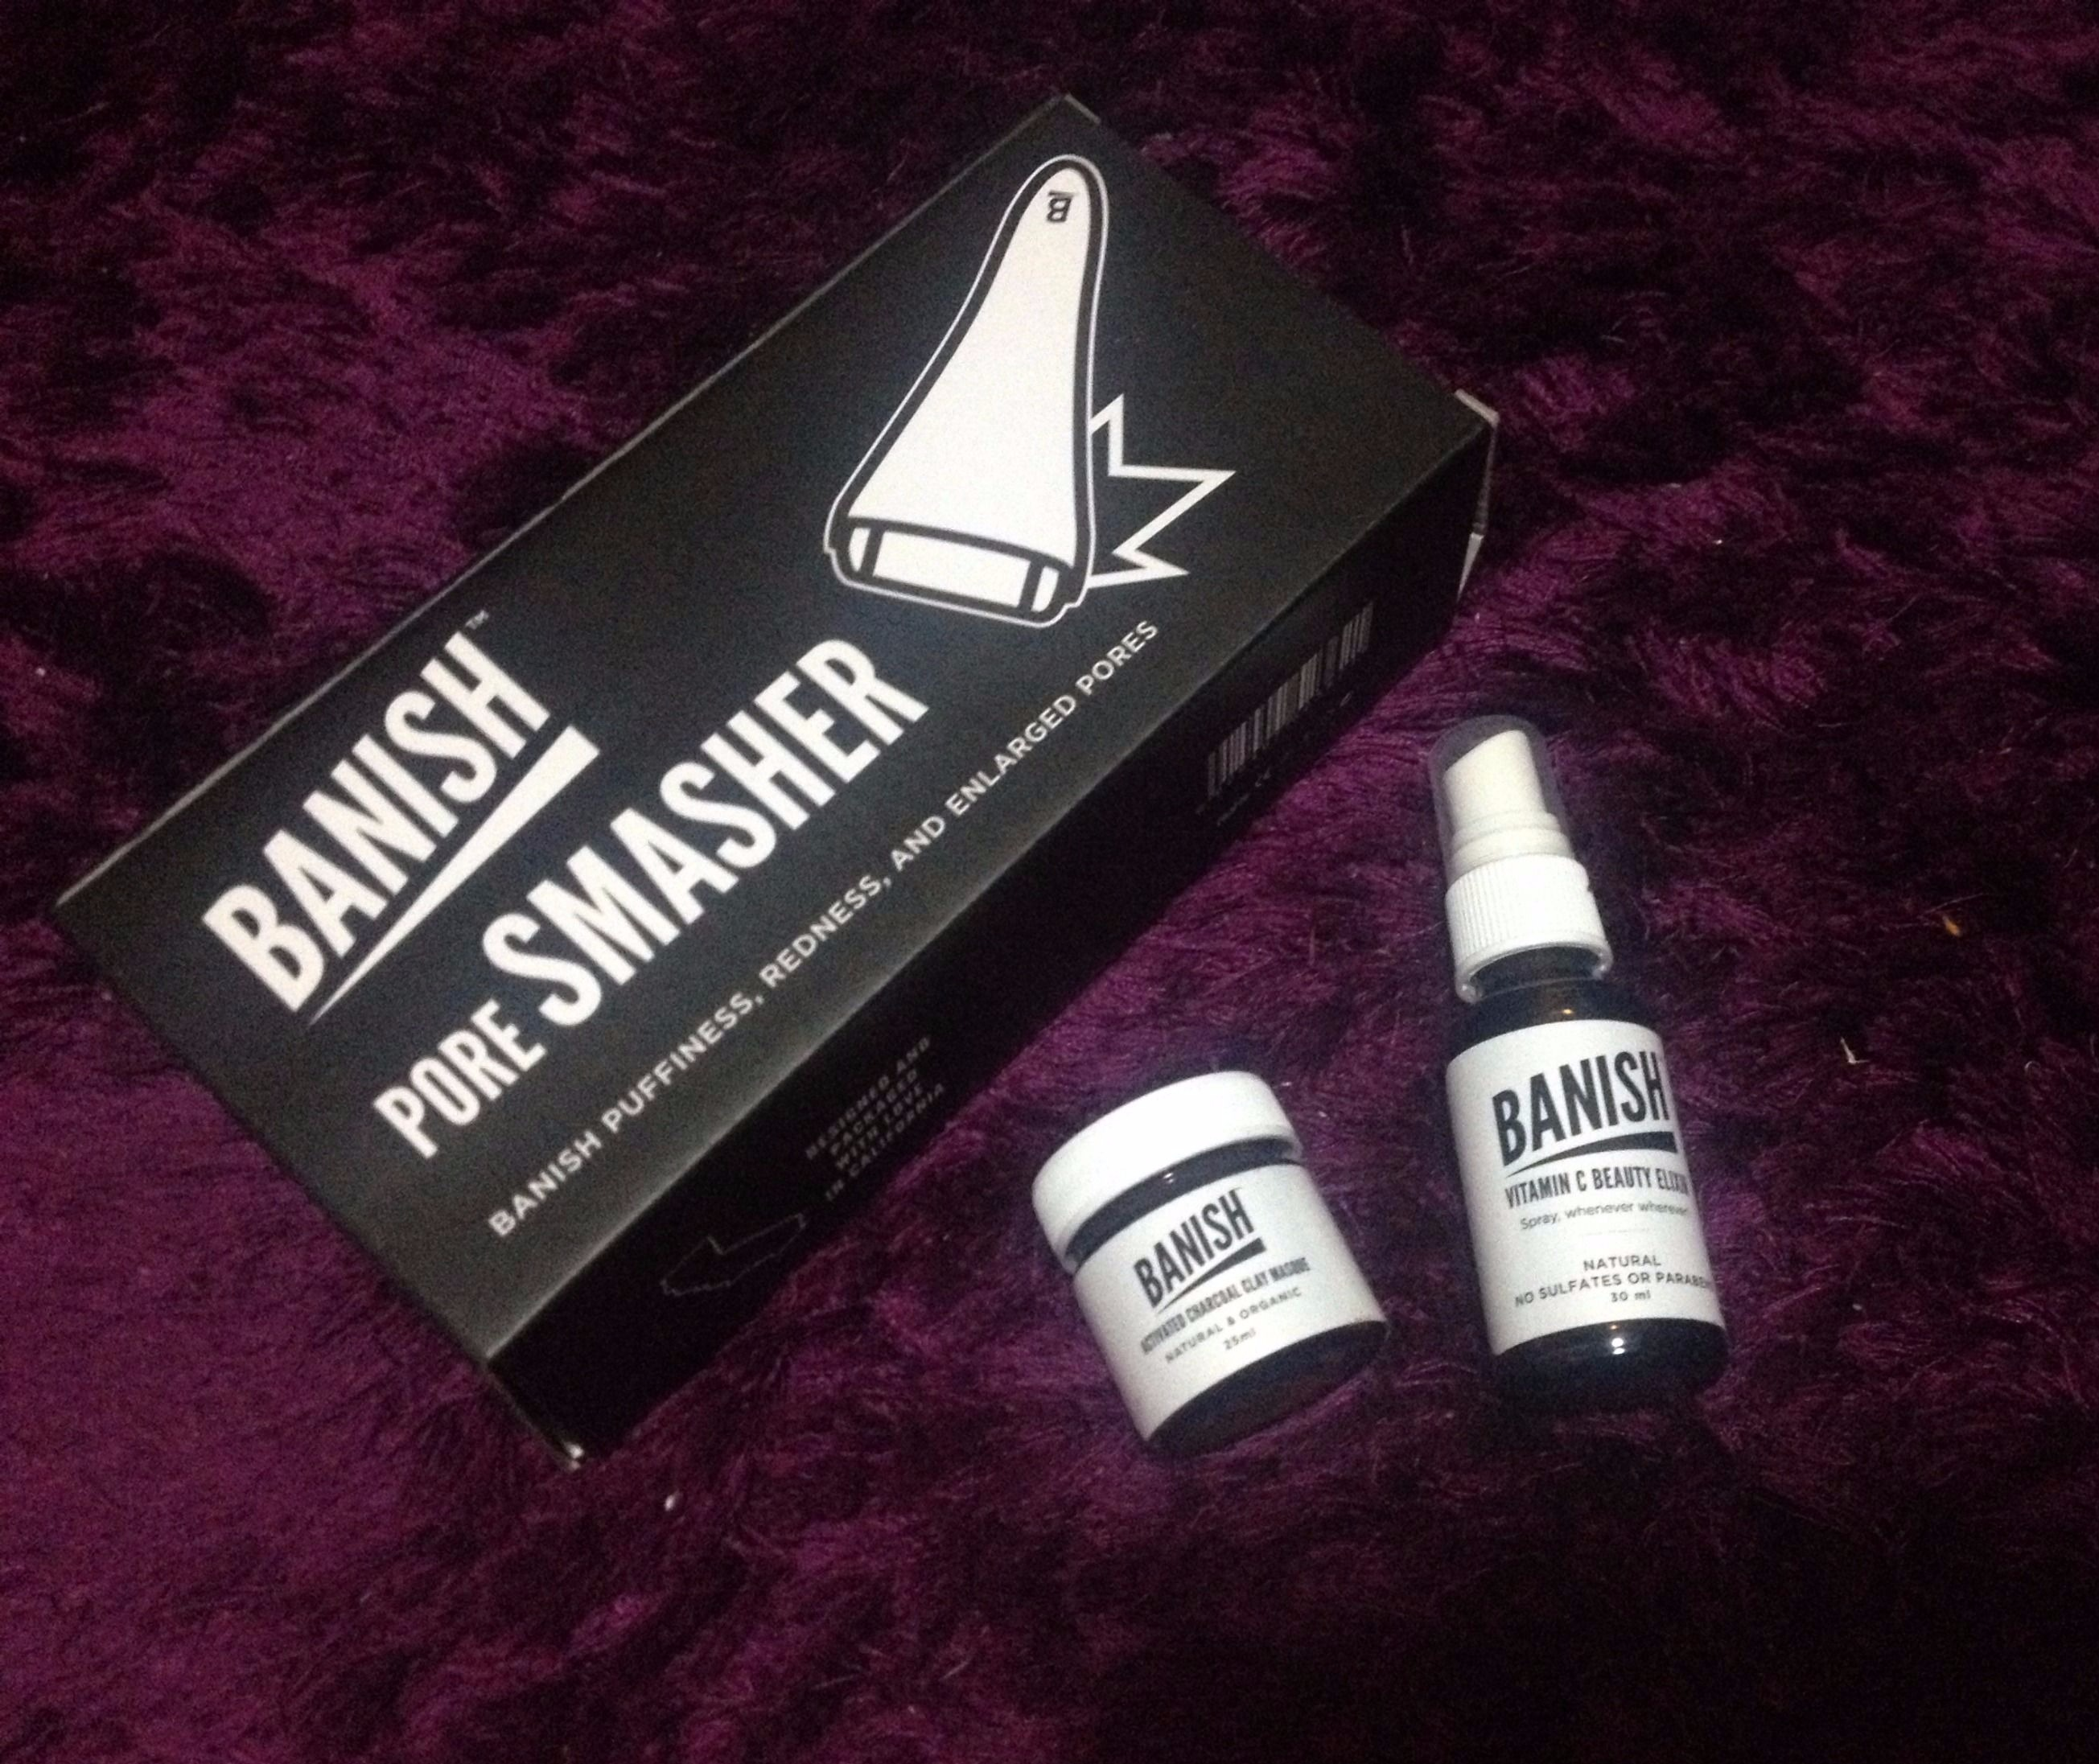 Banish Acne Scars | Reabastecendo o estoque